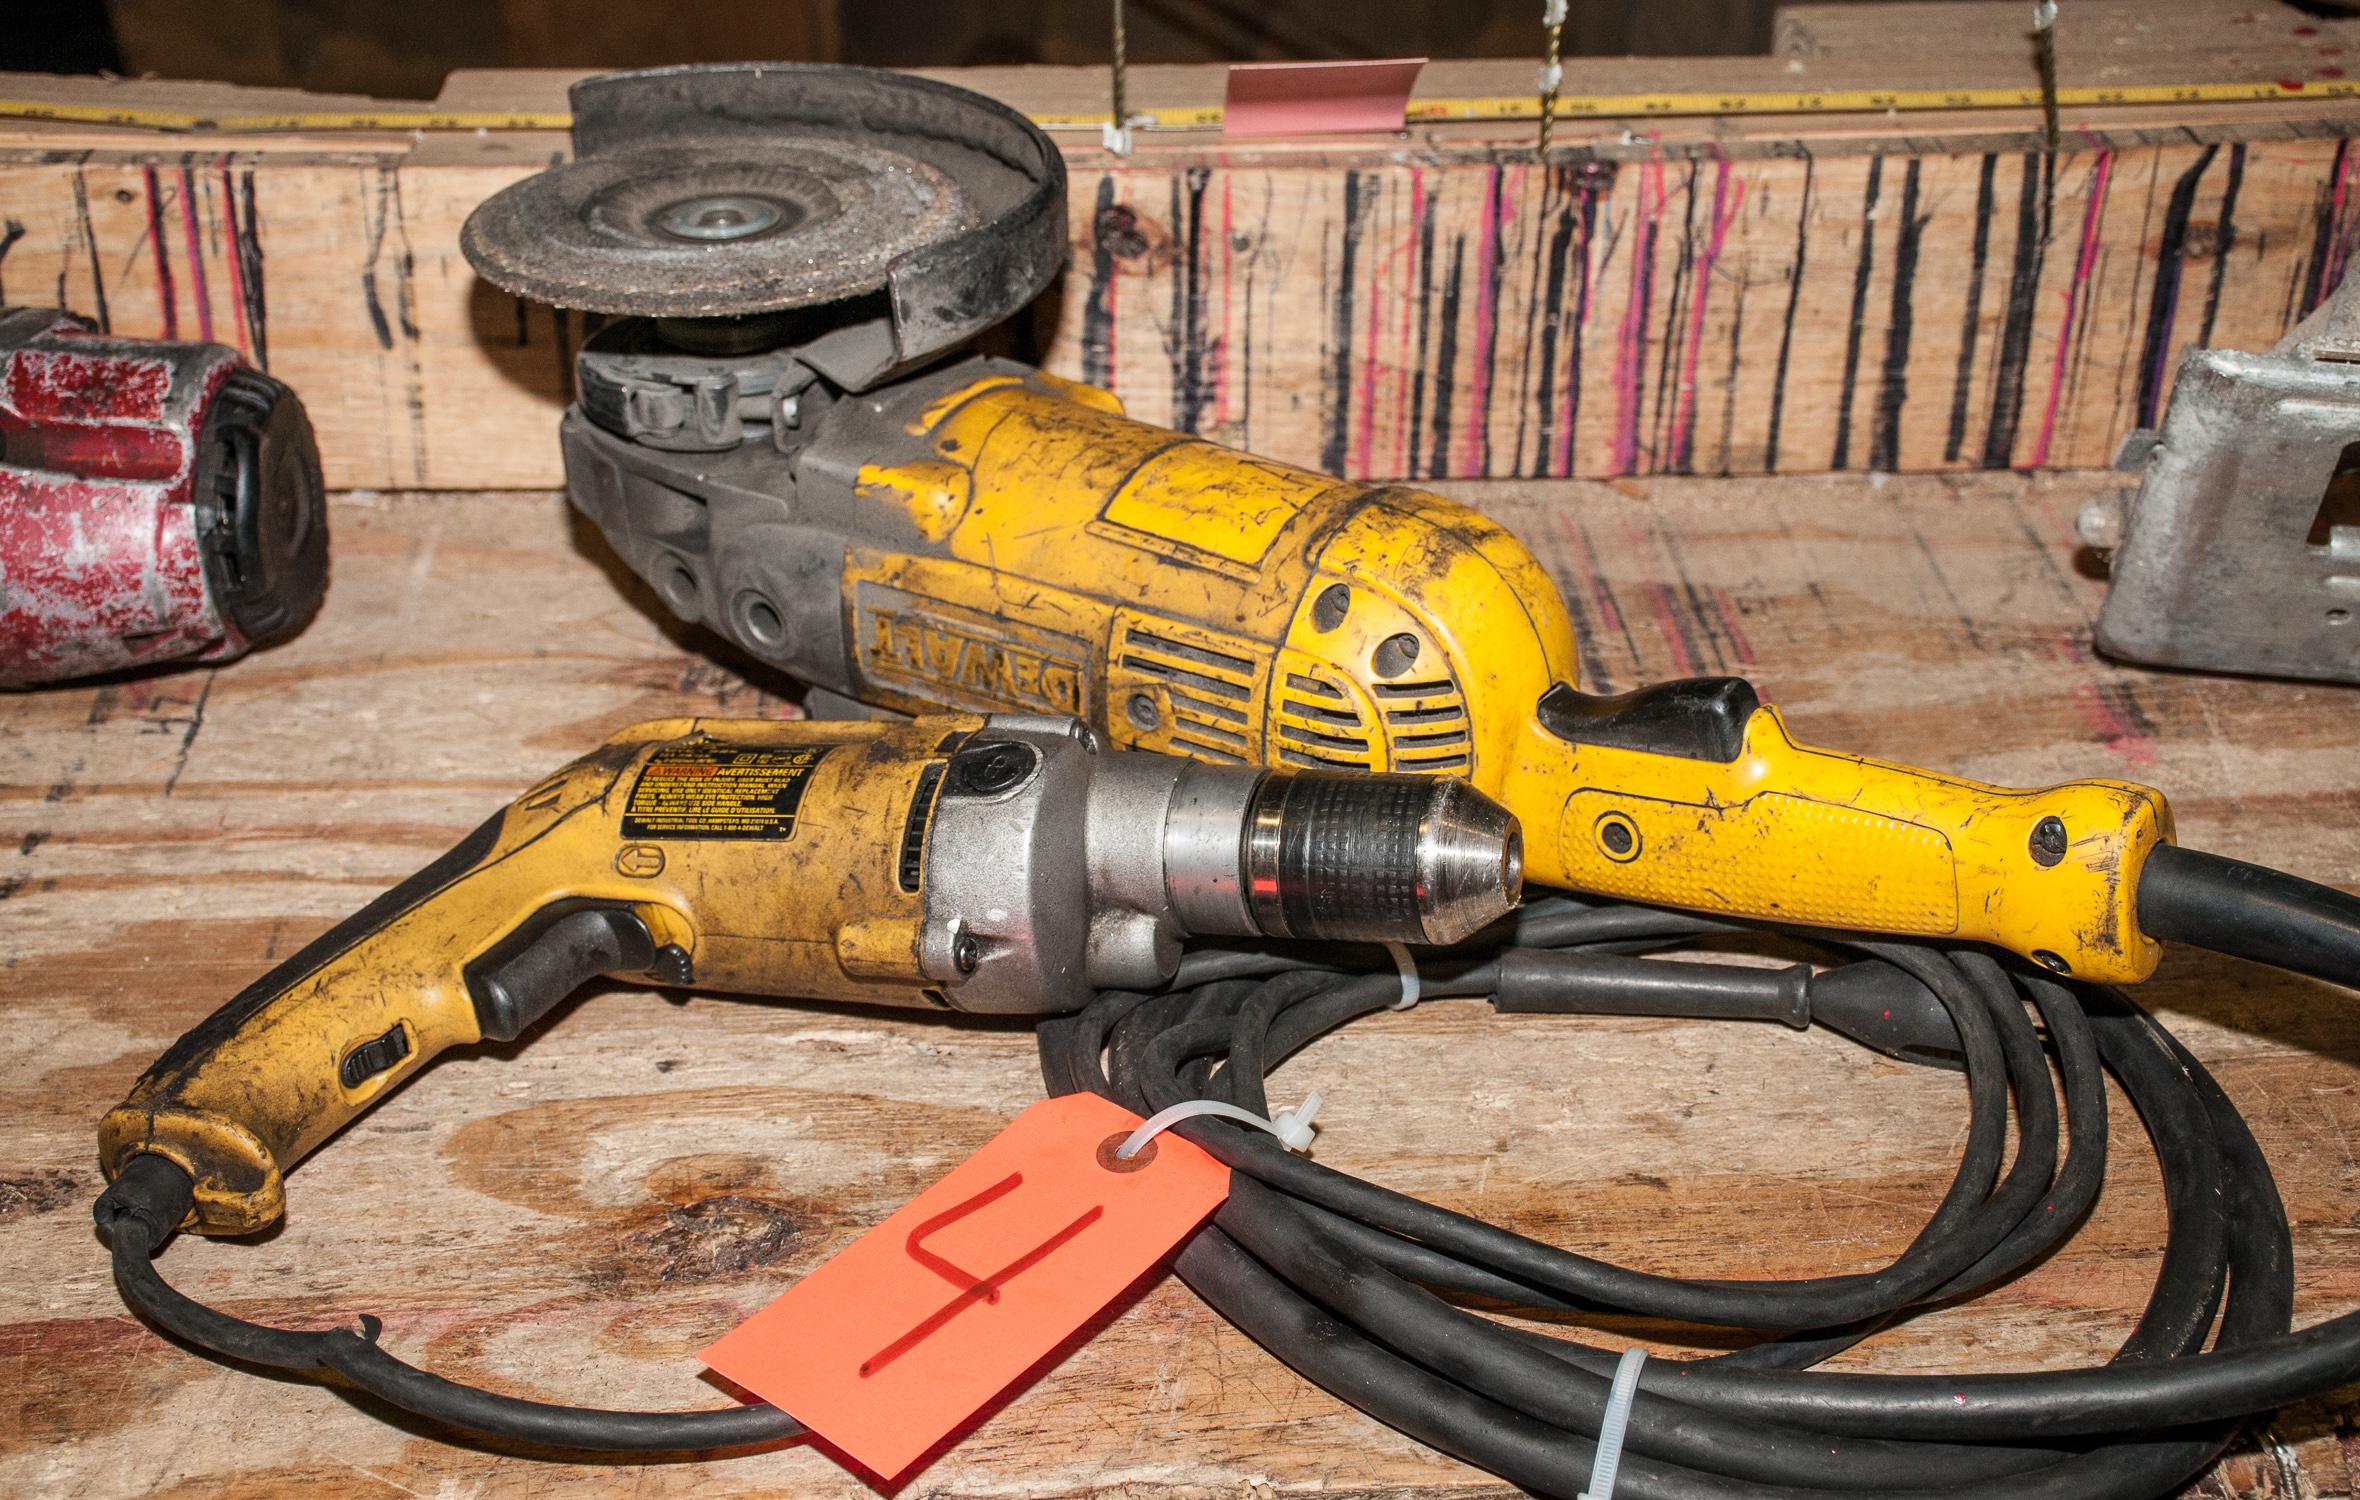 "DeWalt Mdl. W236 1/2"" Electric VSR Drill & 7"" DeWalt Angle Grinder"